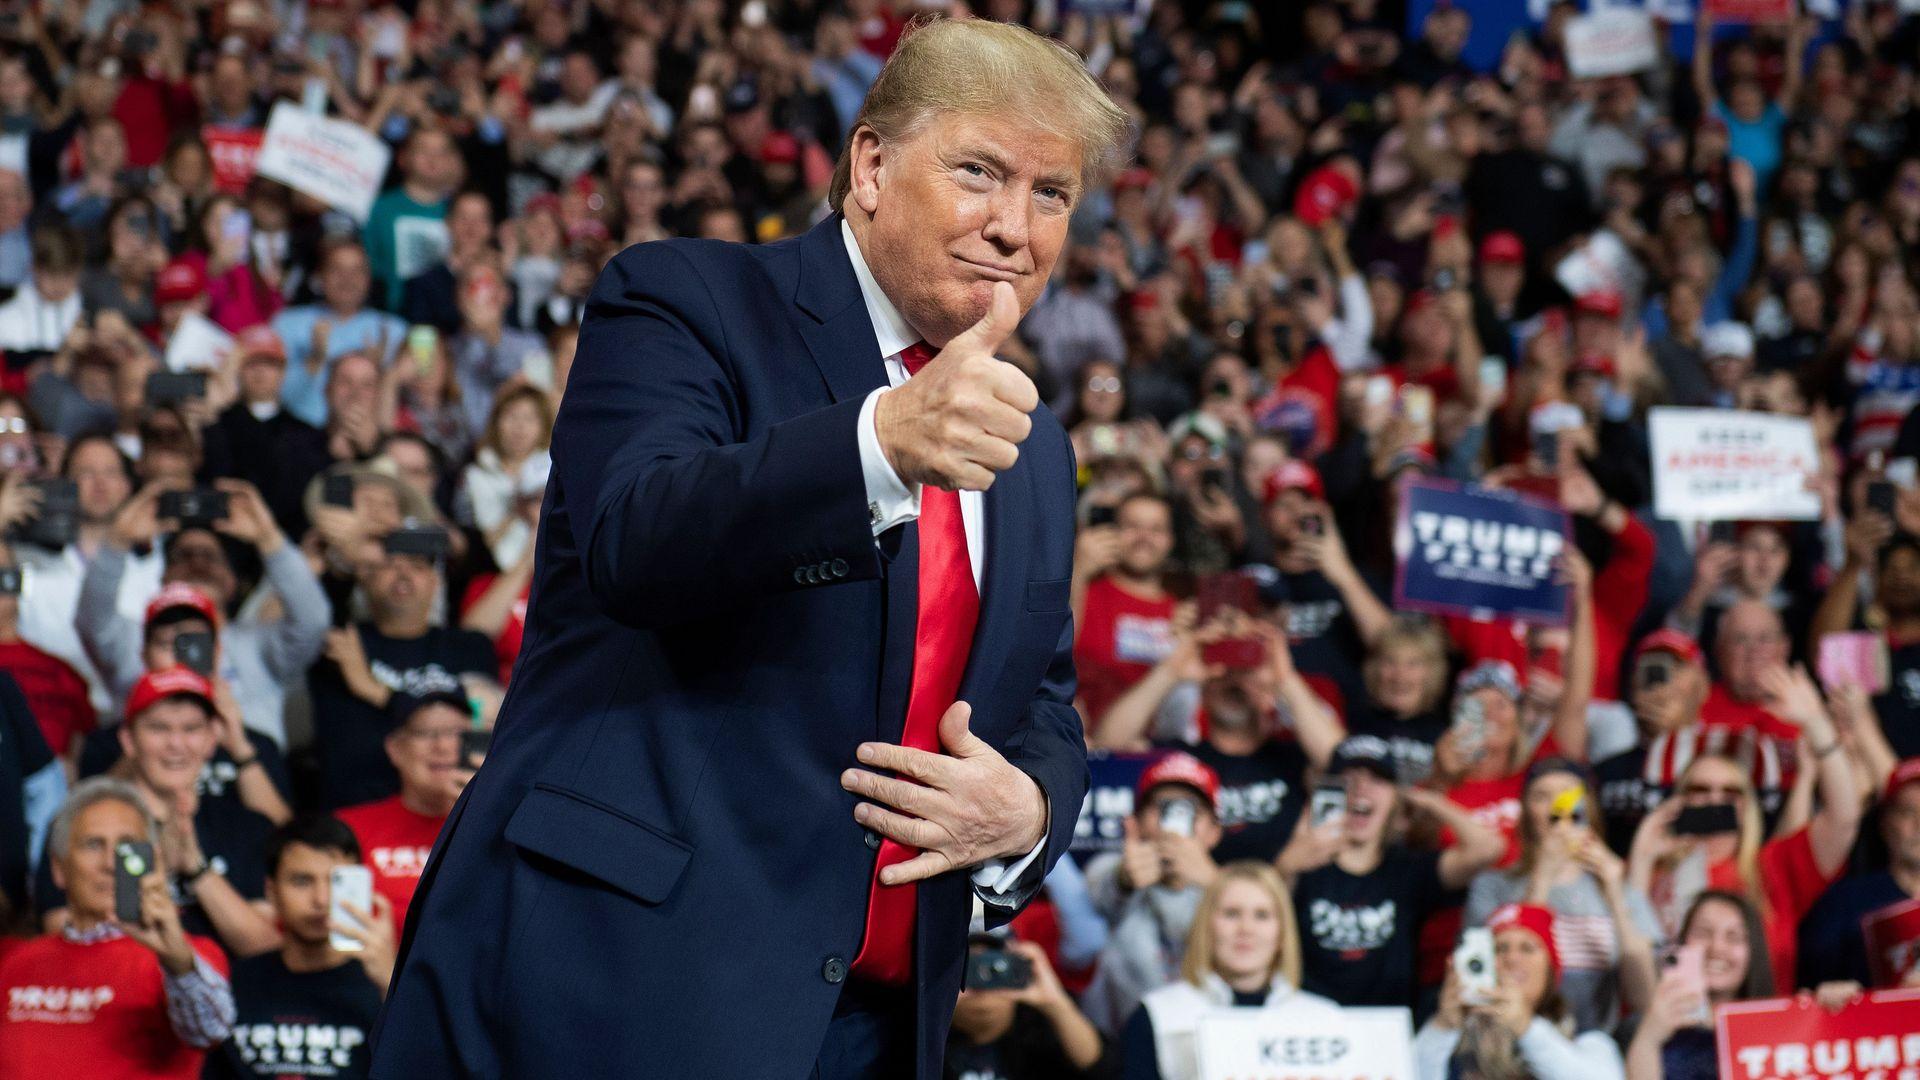 Poll: Confidence in economy boosts Trump's re-election prospects despite his unpopularity